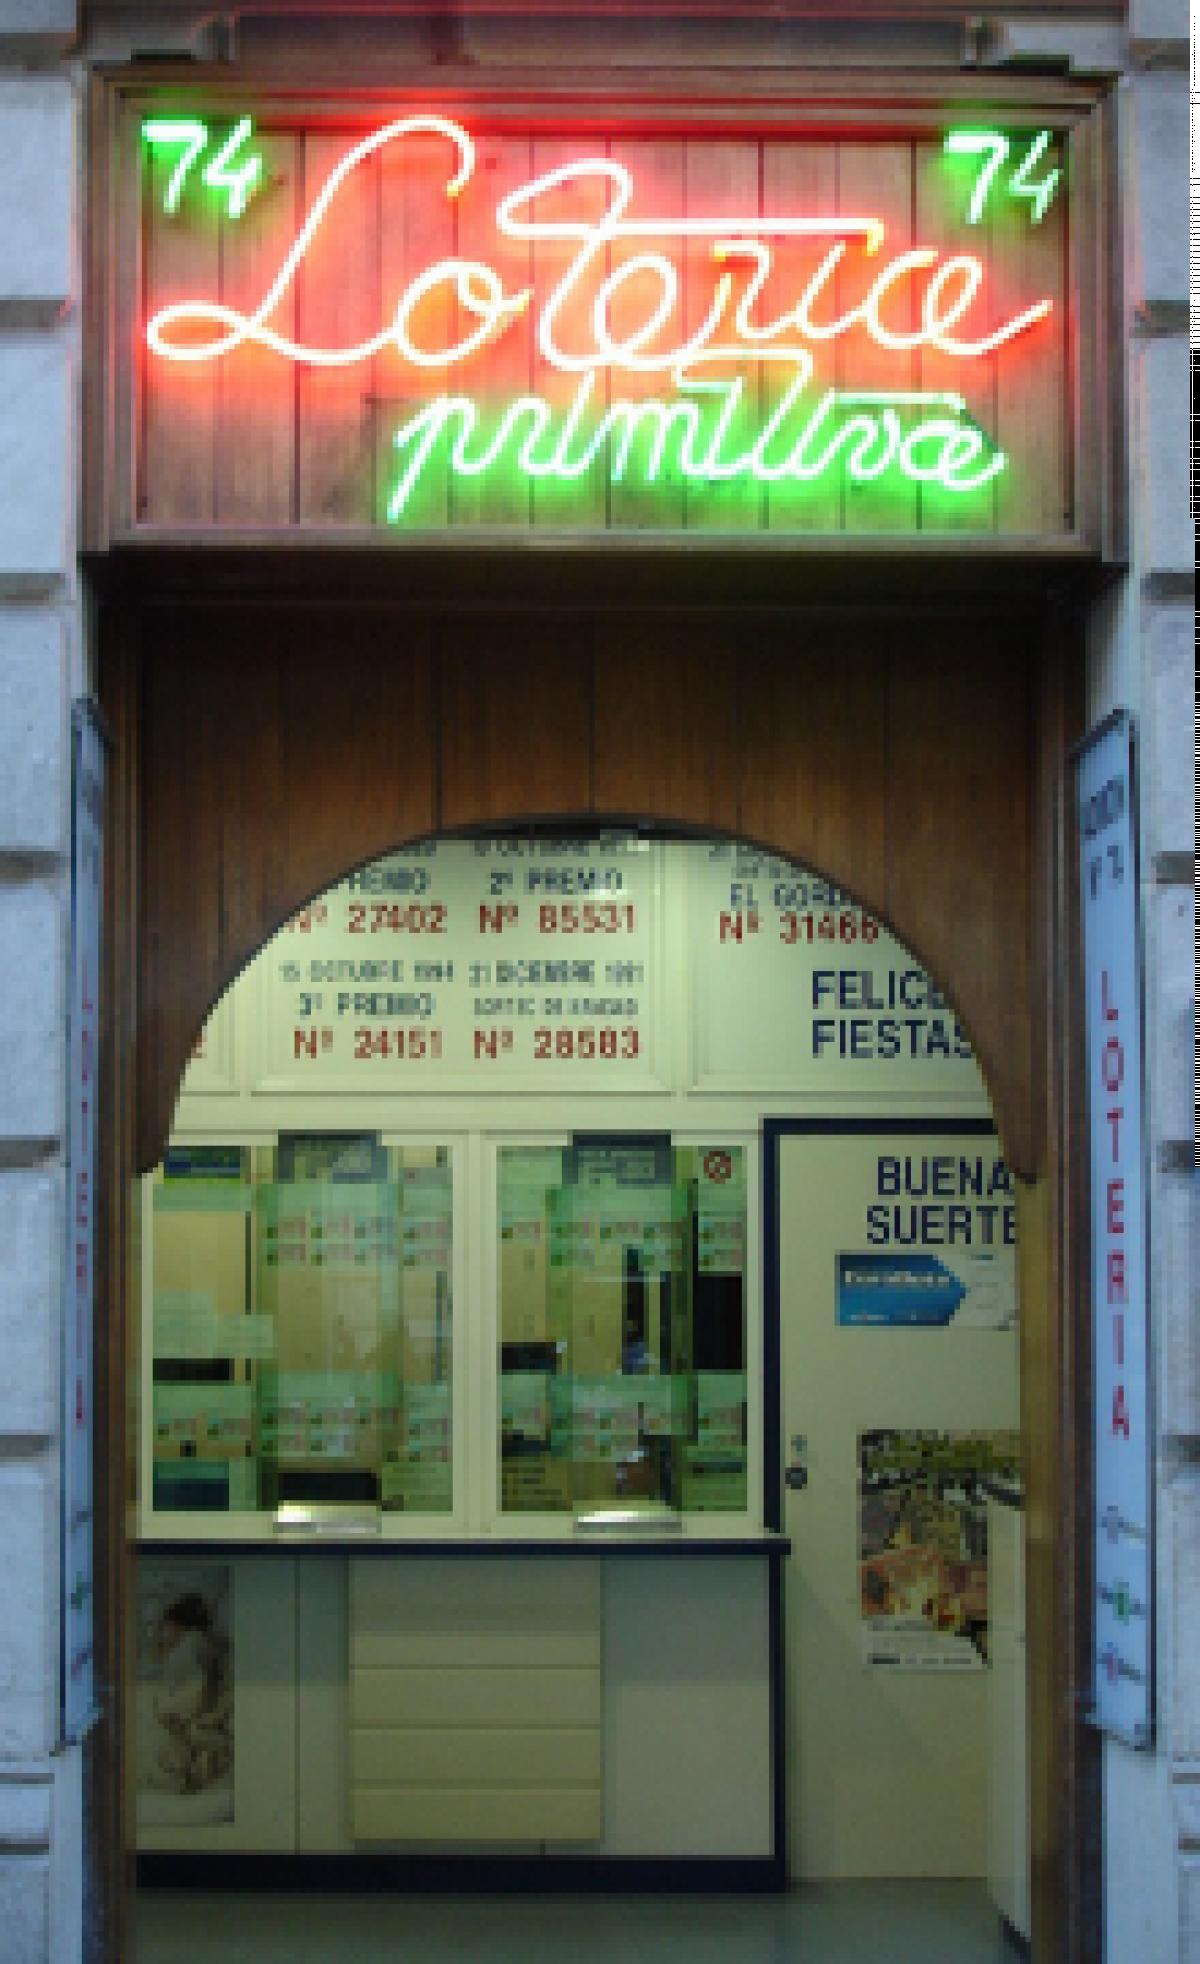 Admon 74 Barcelona MOLINER